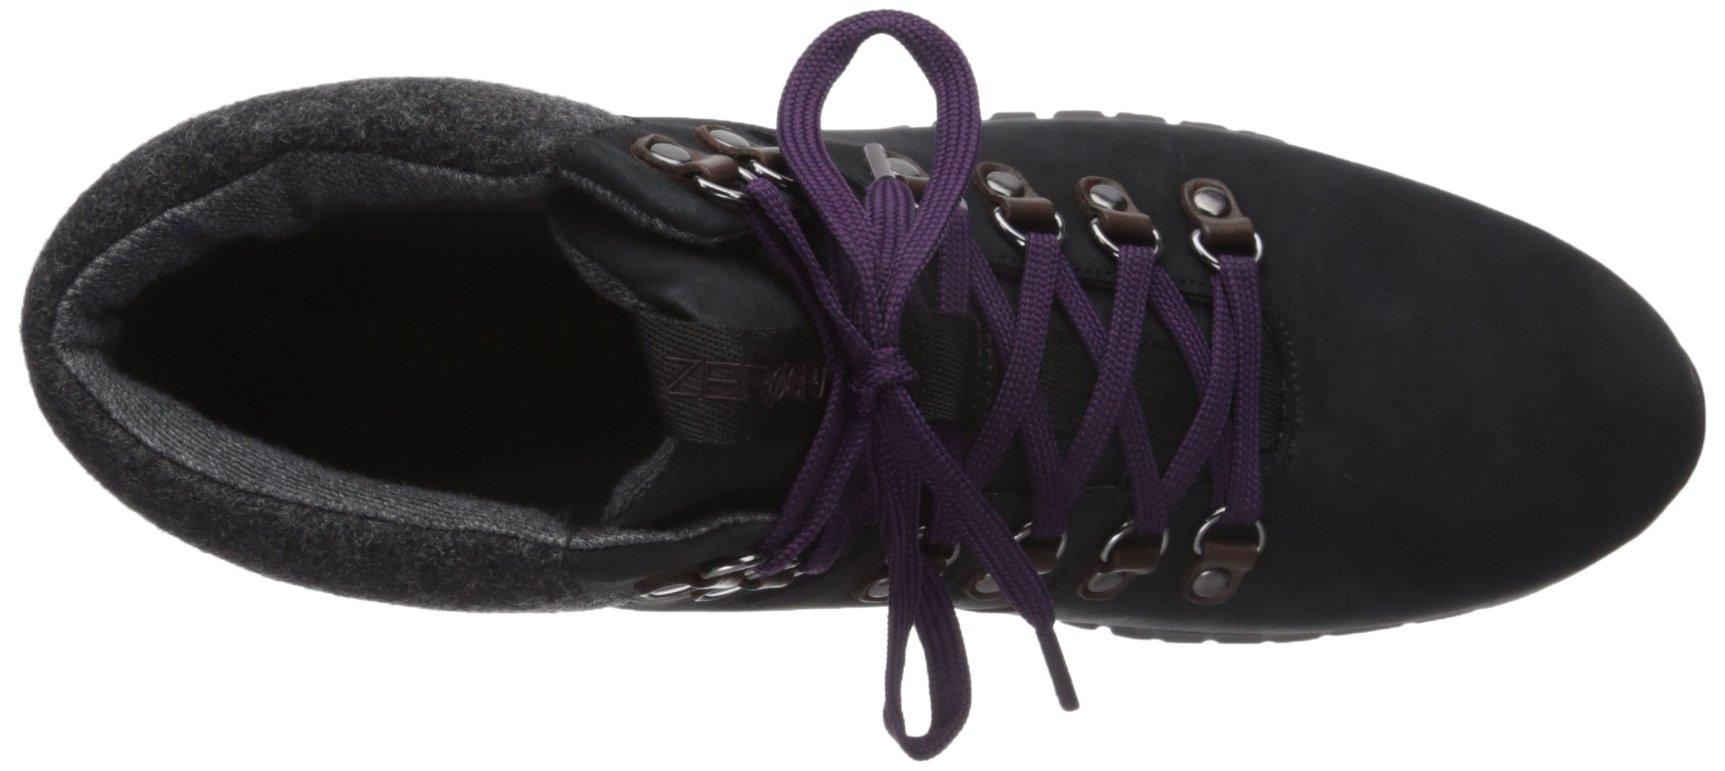 Cole Haan Women's Zerogrand Hikr Boot, Black, 9.5 B US by Cole Haan (Image #8)